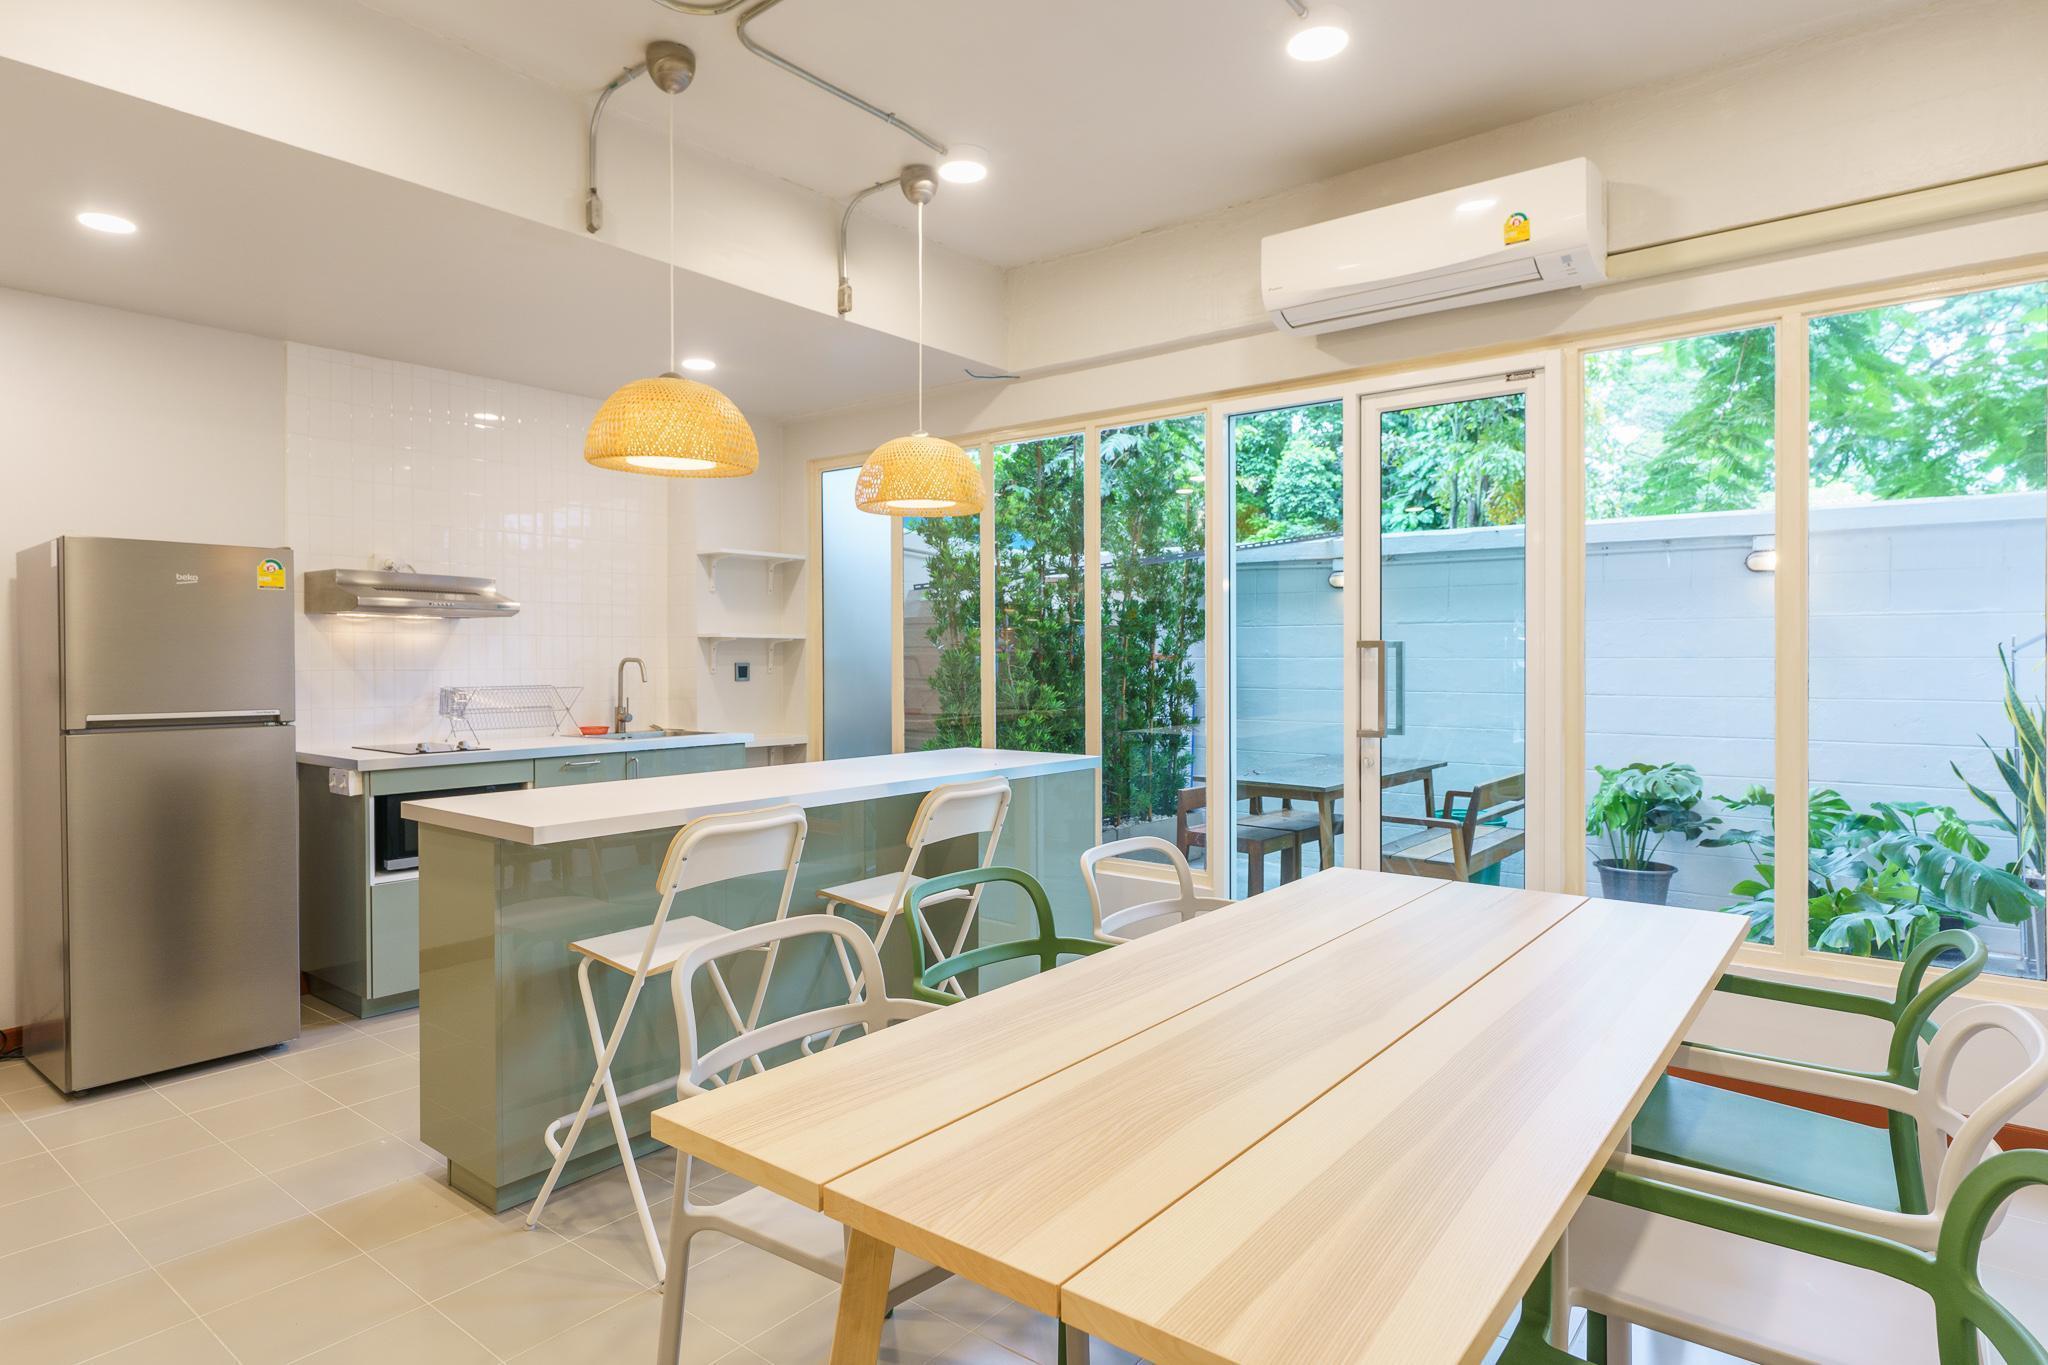 ART&ZEN Entire House @SUKHUMVIT39 BTS Phrompong บ้านเดี่ยว 4 ห้องนอน 4 ห้องน้ำส่วนตัว ขนาด 240 ตร.ม. – สุขุมวิท